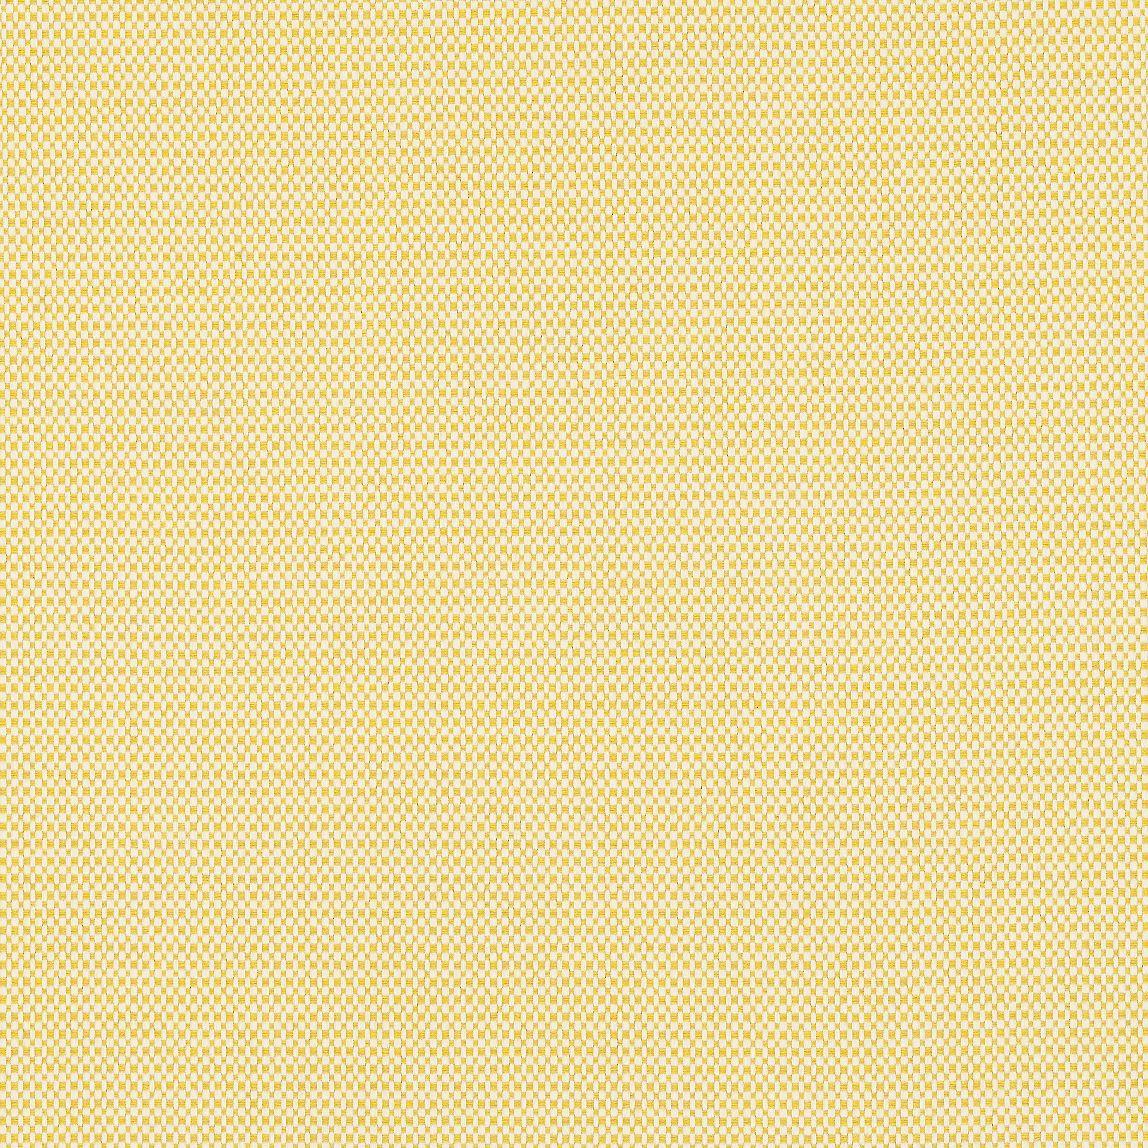 Square One Lemon Swatch